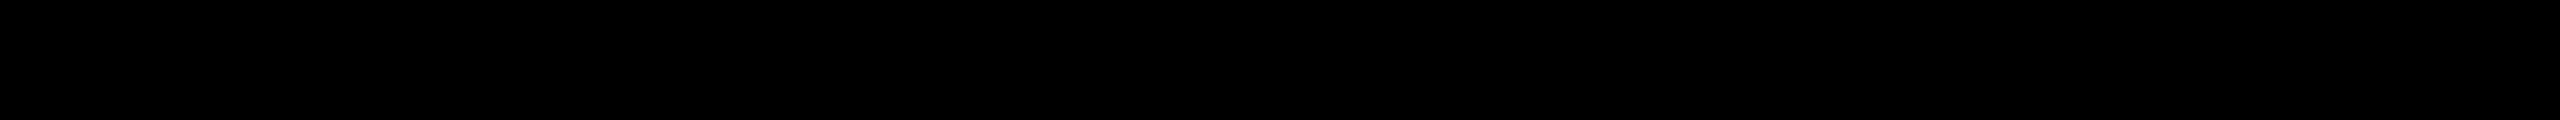 ORIIMEC DE MEXICO S.A.DE.C.V.